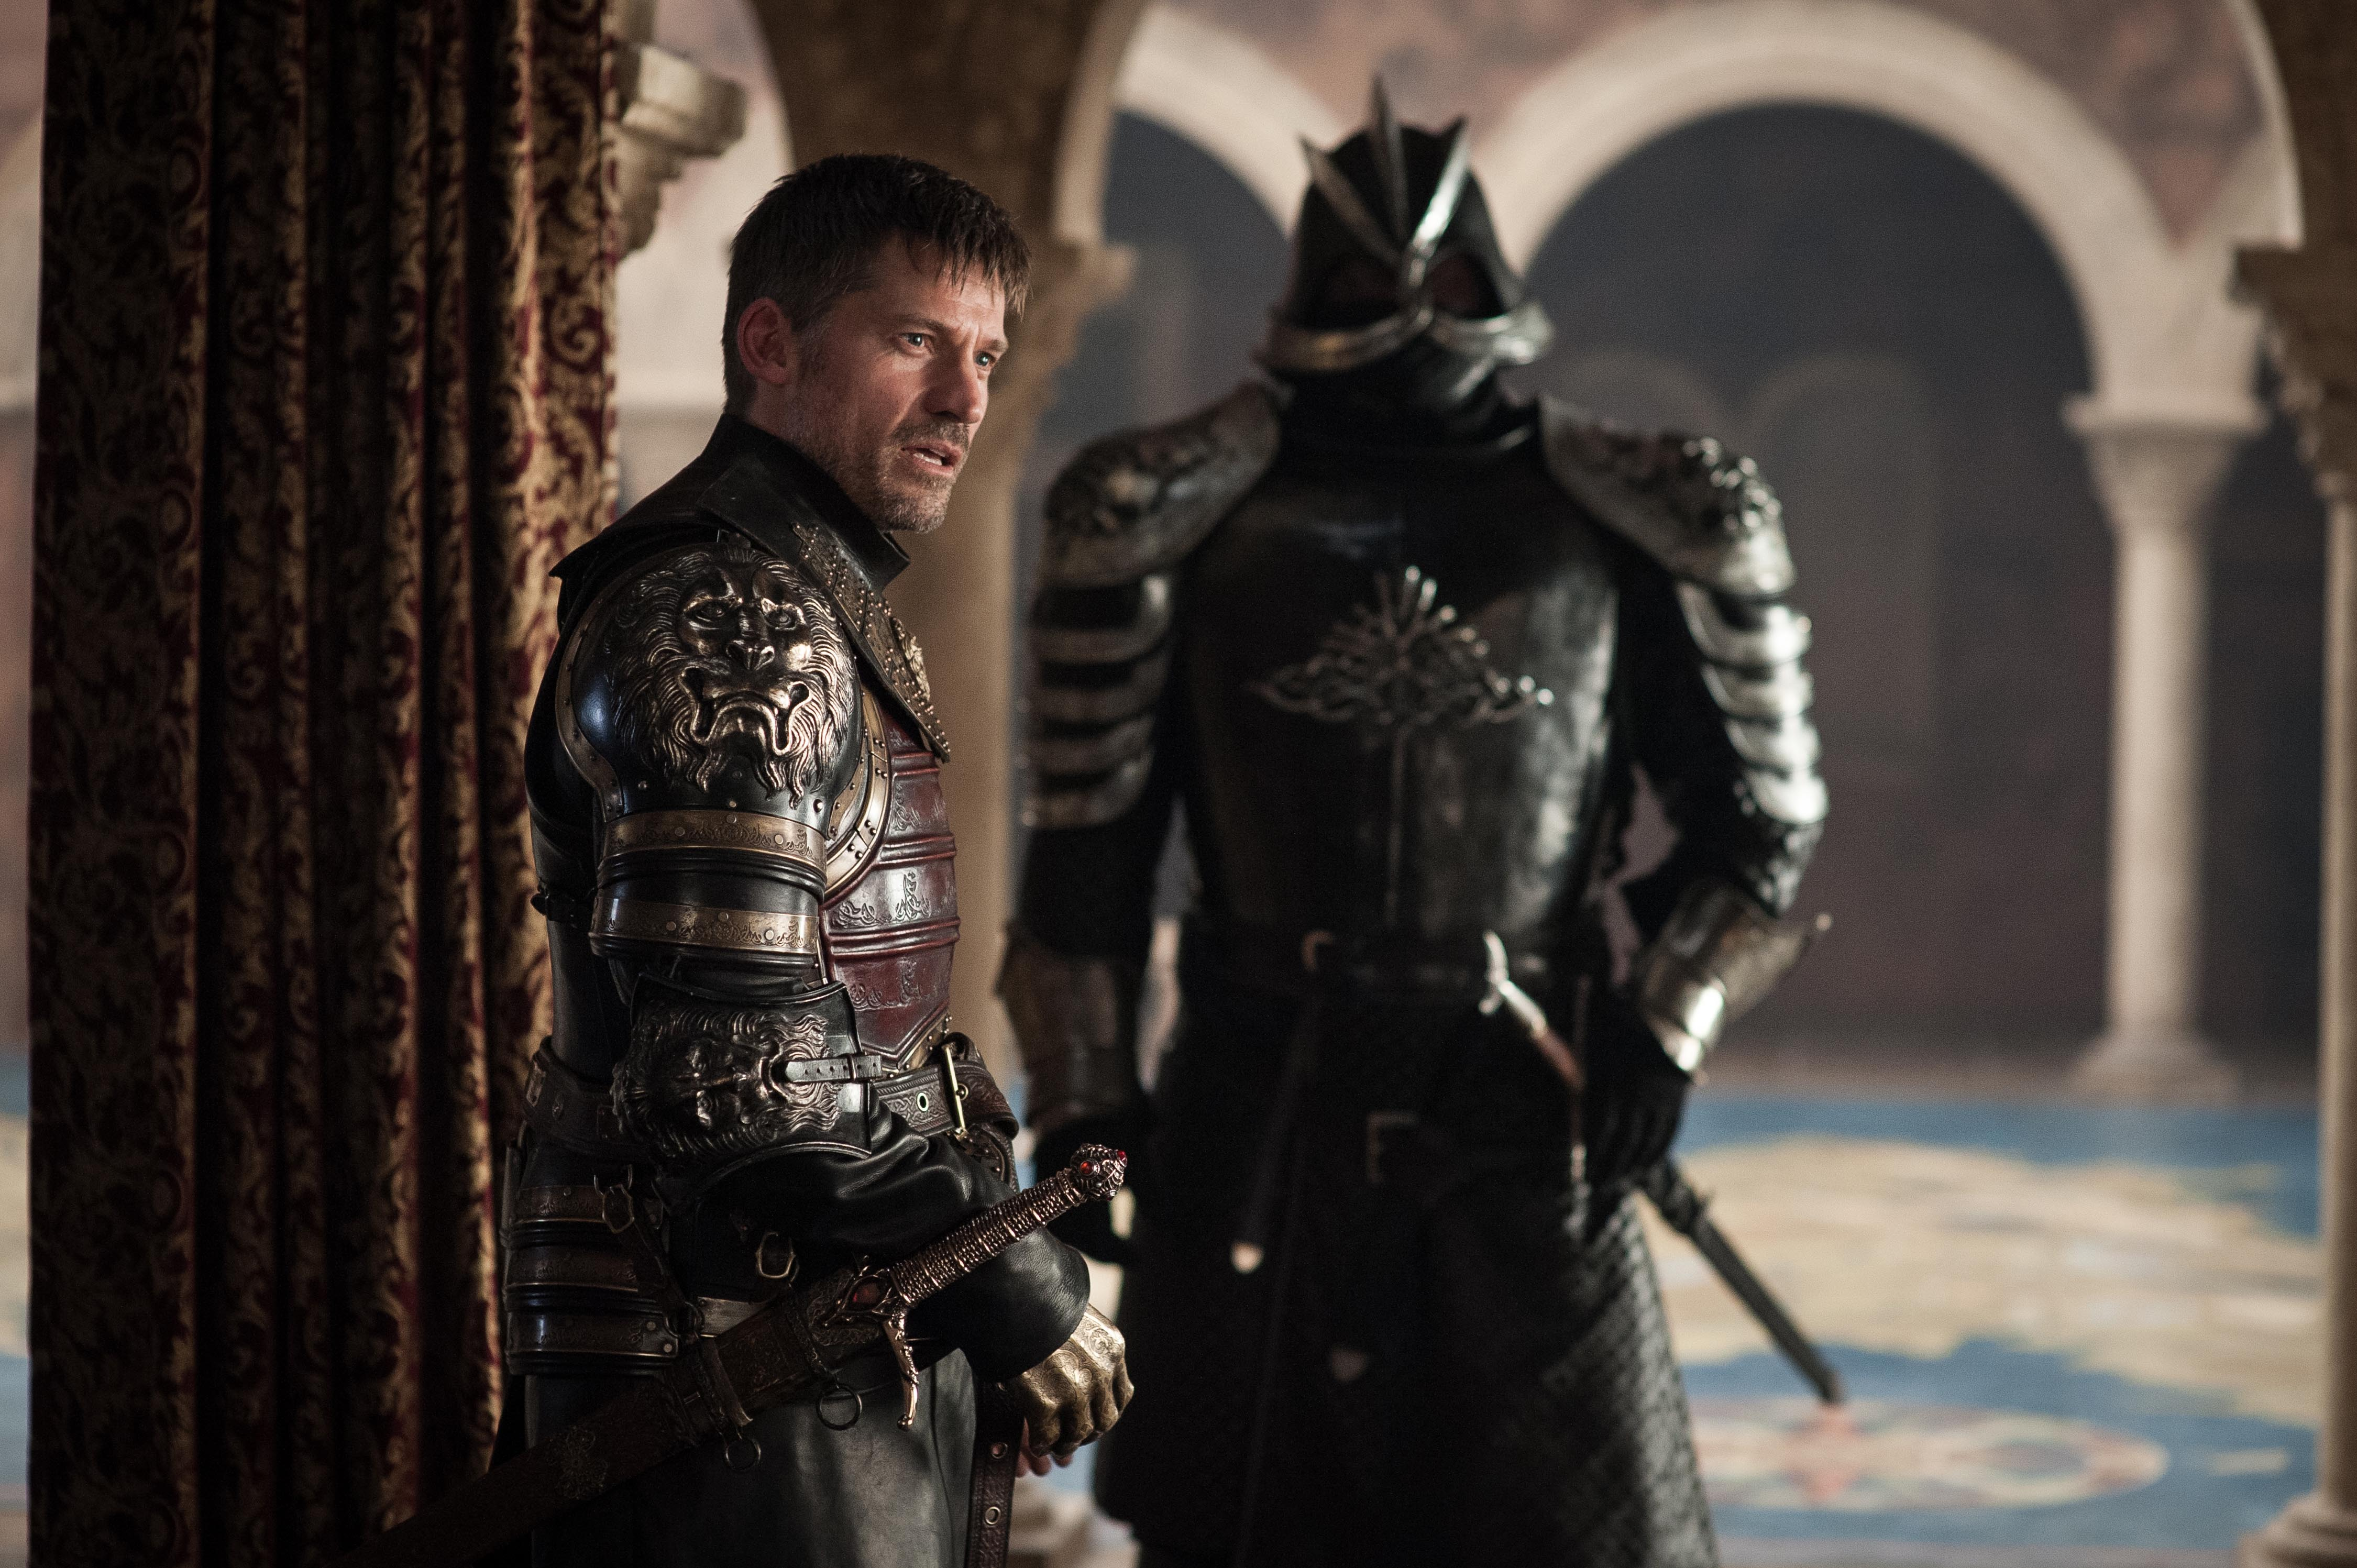 707 - King's Landing - Jaime, Gregor 1